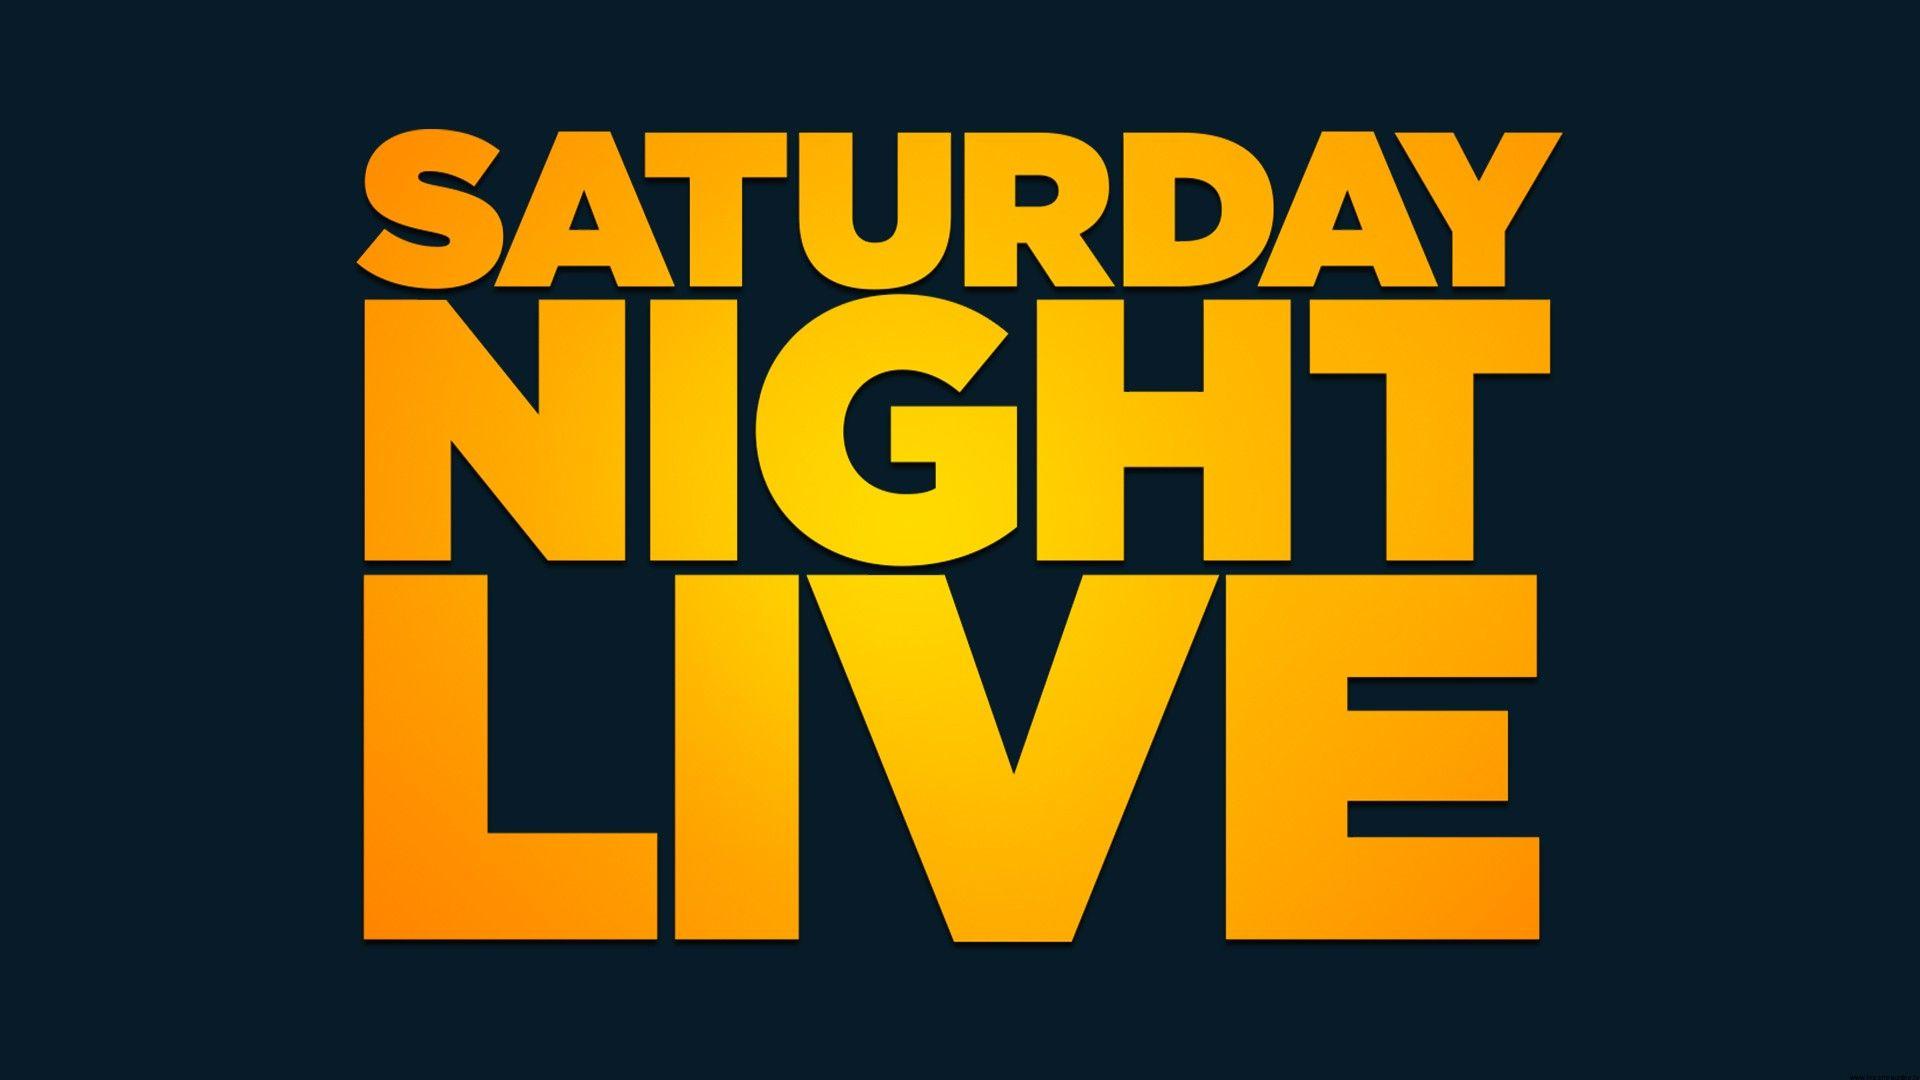 Saturday night live season 41 episode 15 :https://www.tvseriesonline.tv/saturday-night-live-season-41-episode-15/